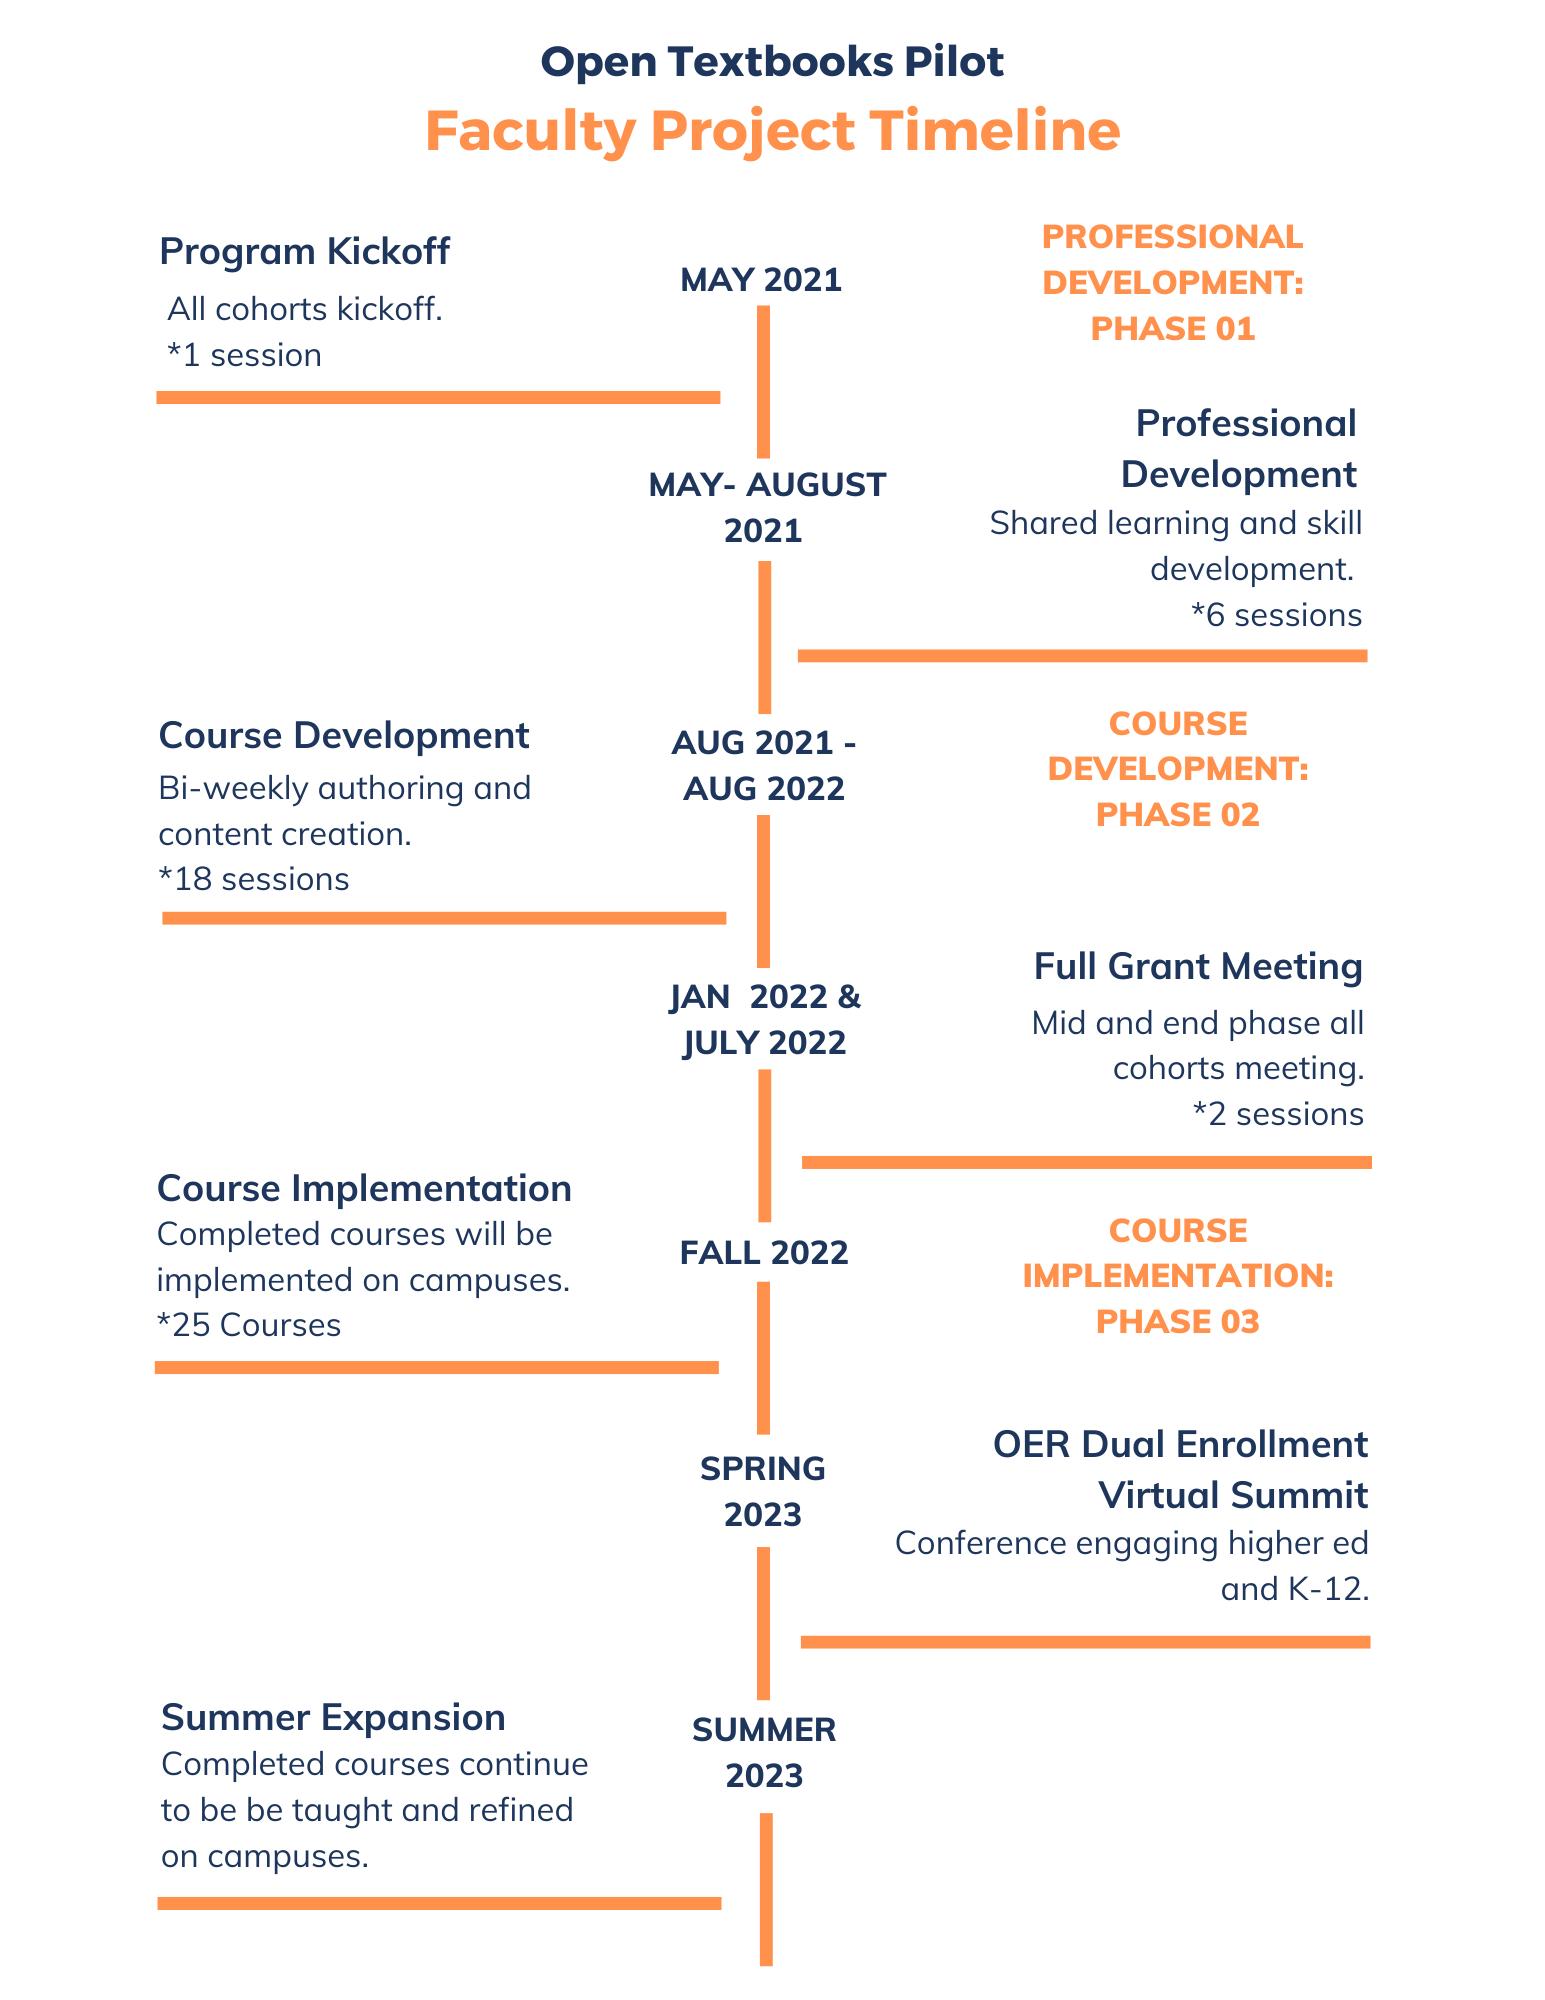 Open Textbooks Pilot Timeline